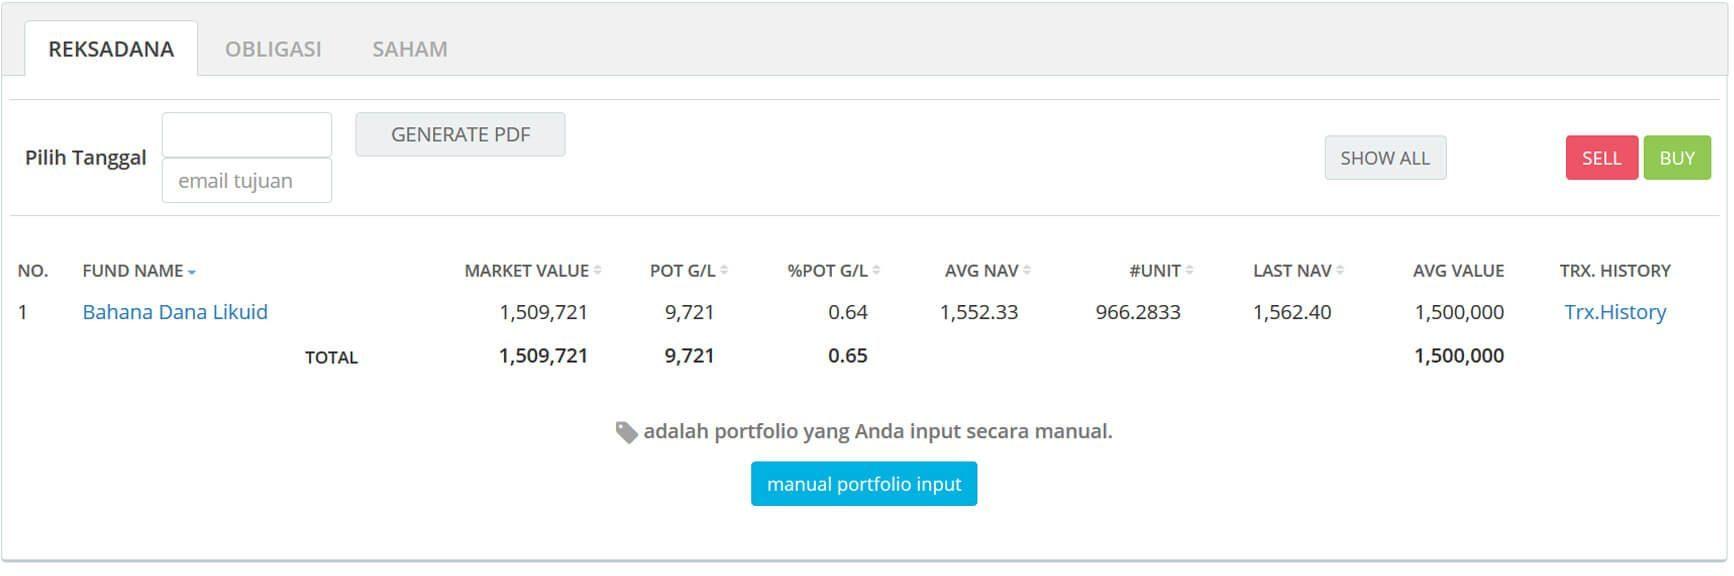 Screenshot Perkembangan Investasi Saham - Day 44, Selasa, 25 Februari 2020 BDL